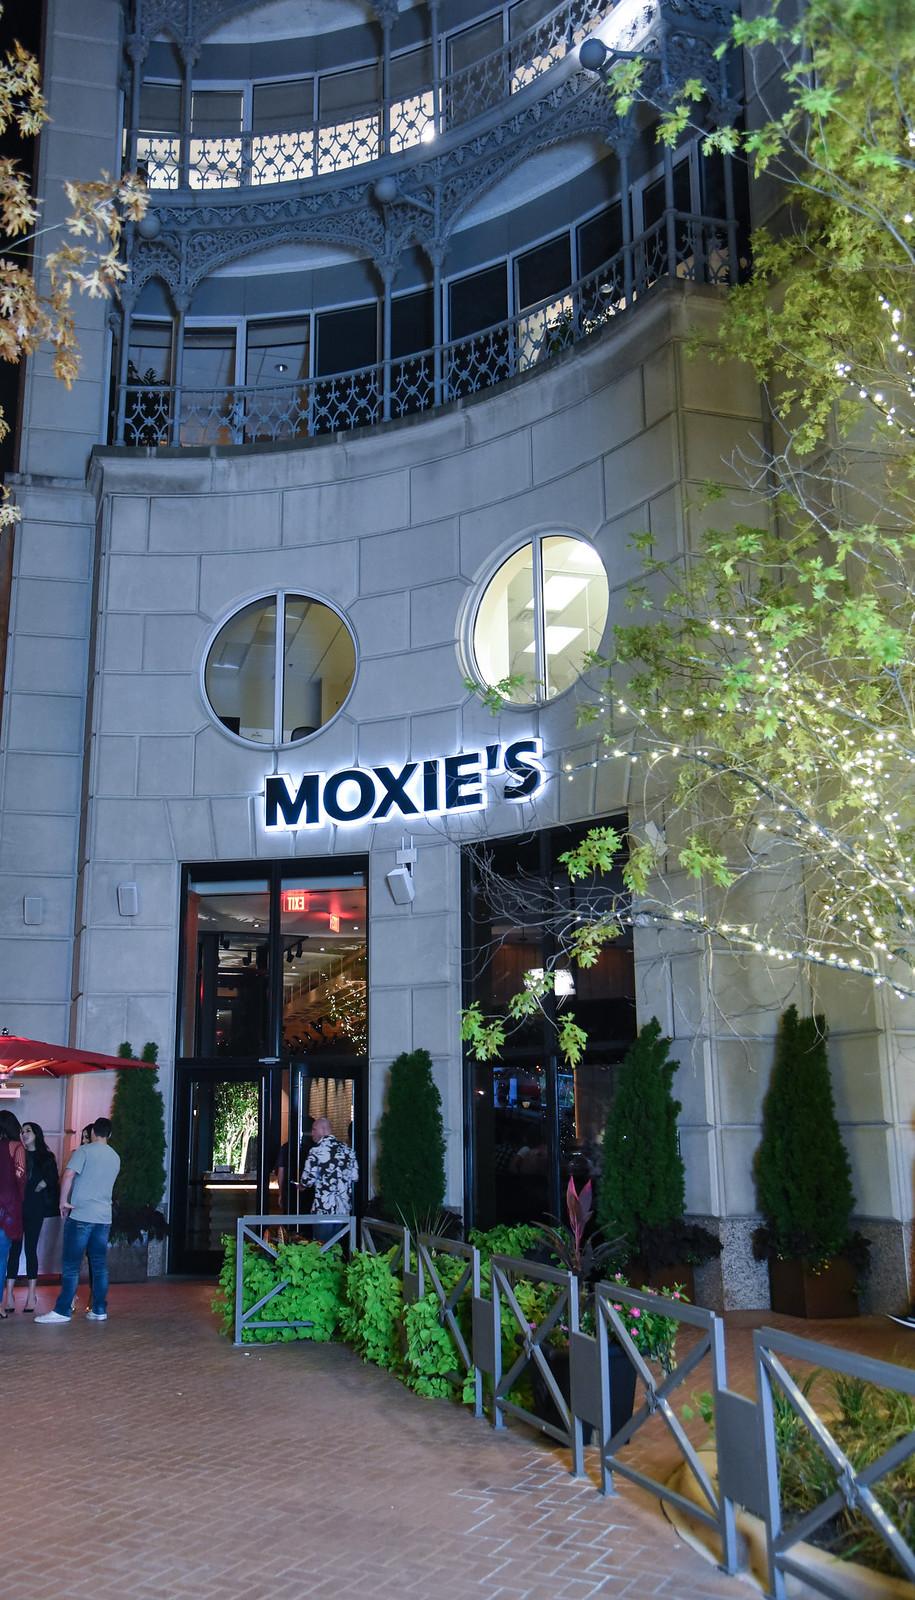 MOXIE'S grill and bar Dallas